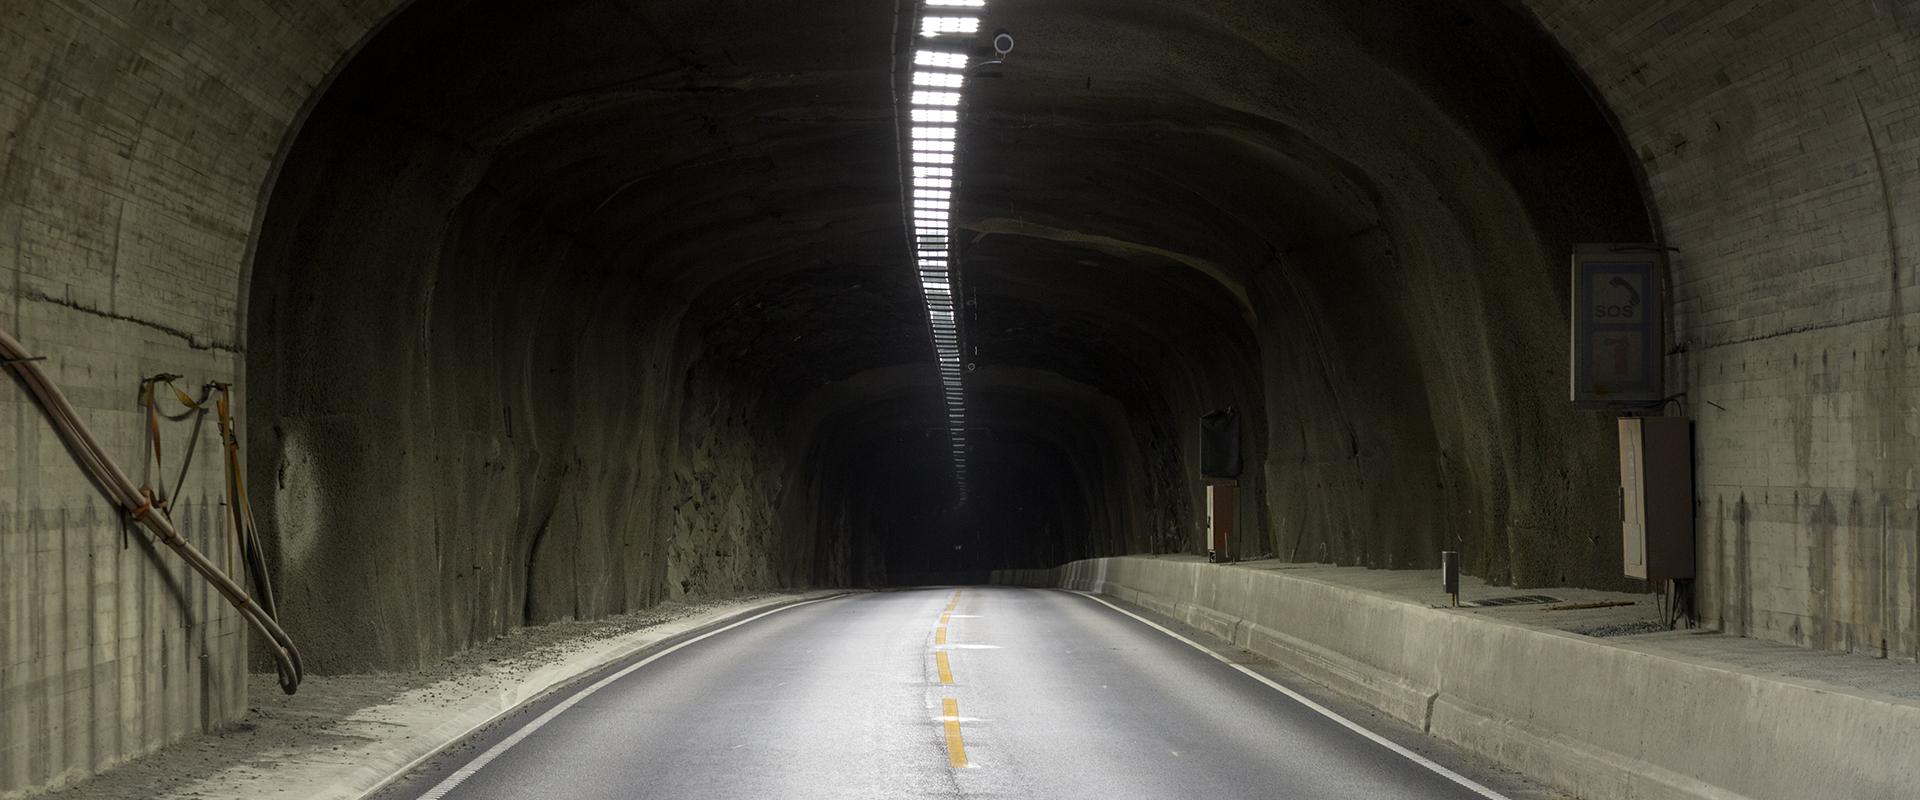 Fari led gallerie stradali